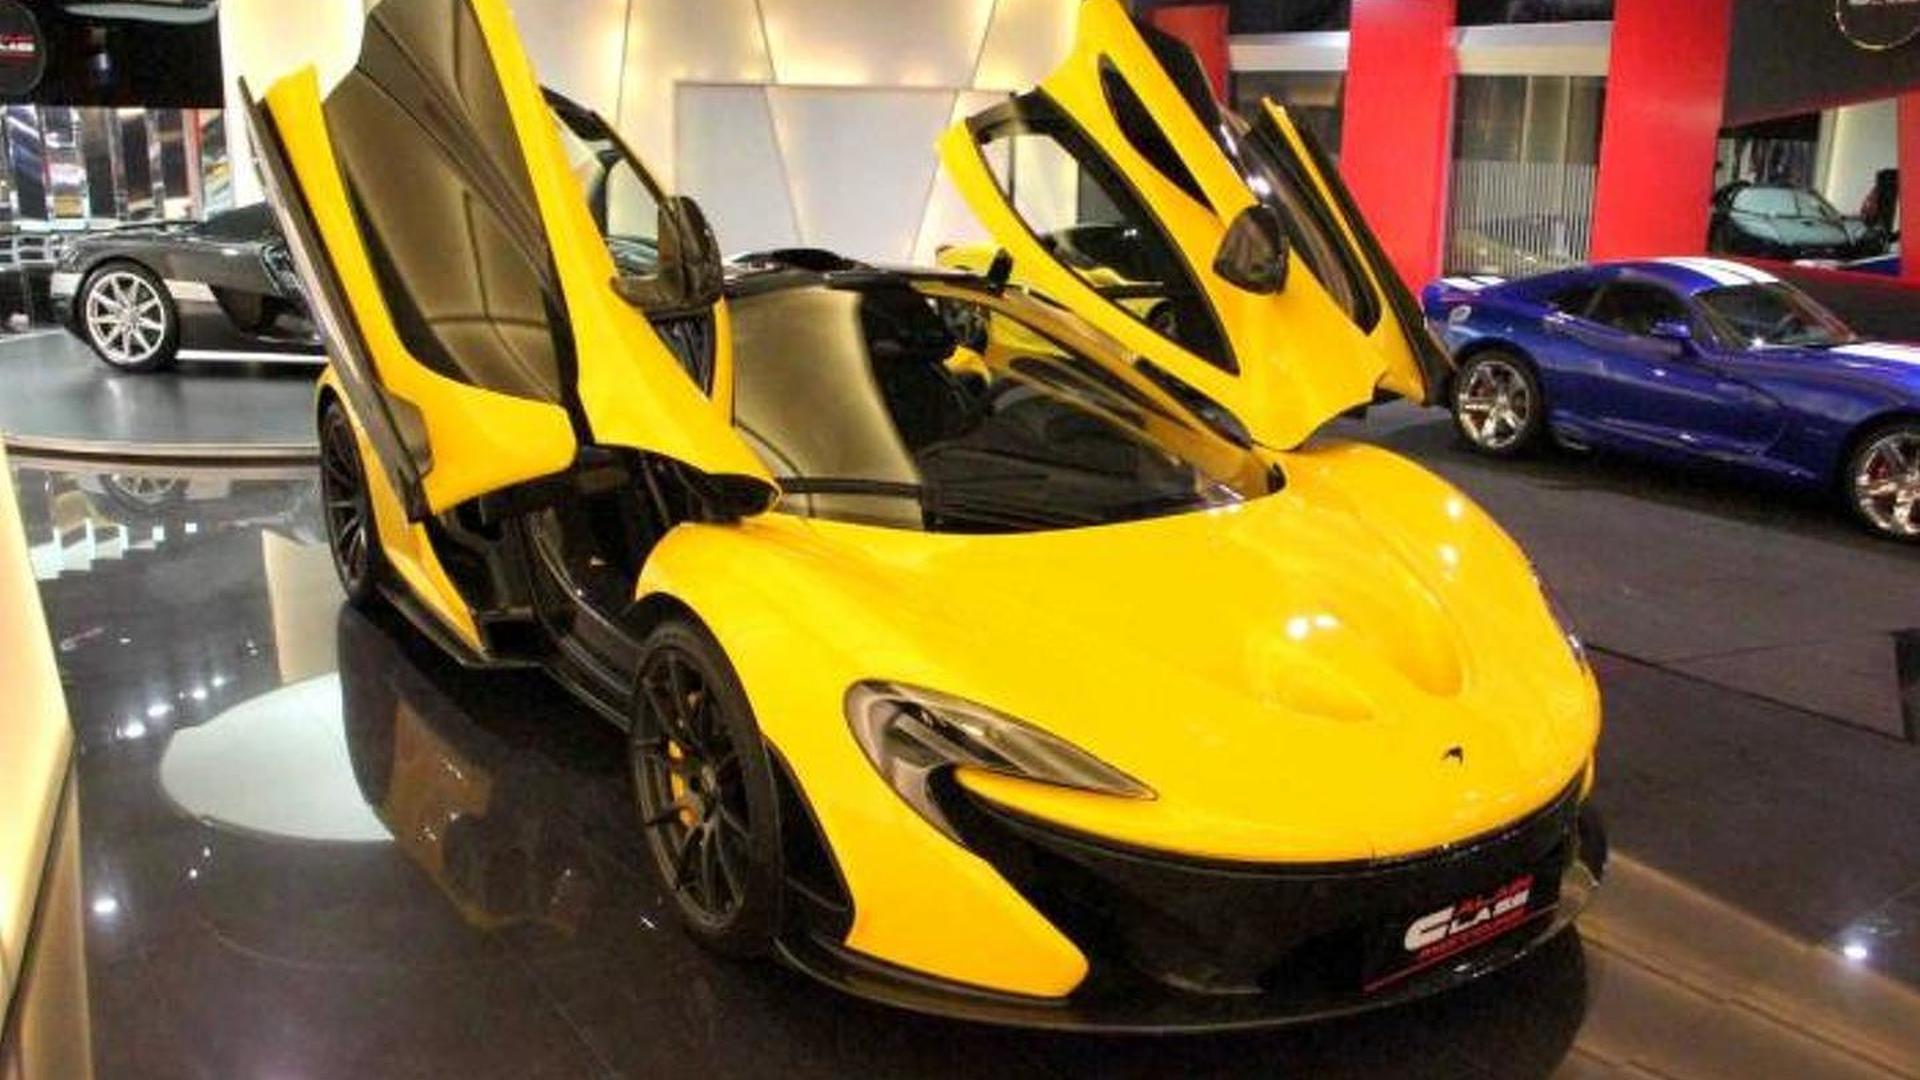 McLaren P1 already on the used car market, available at a Dubai showroom